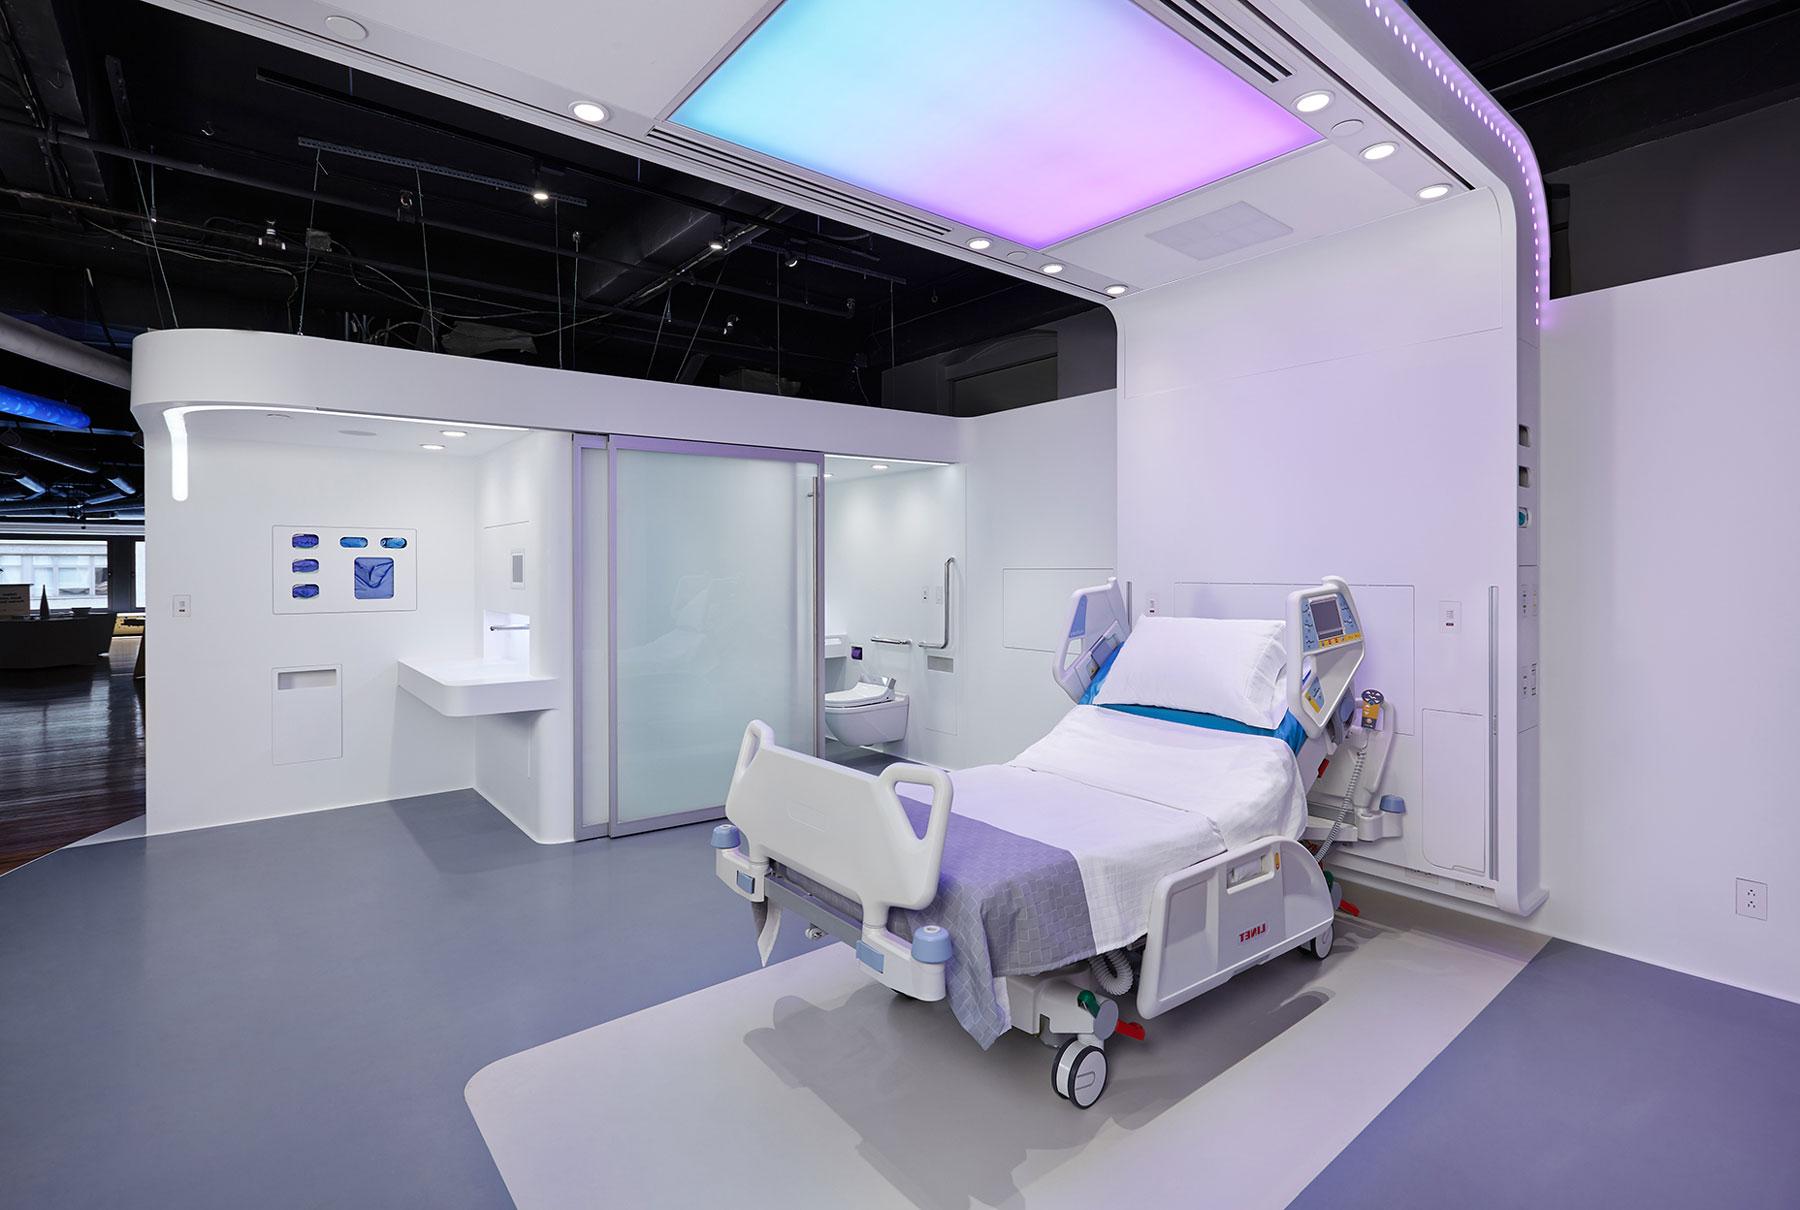 Hospital Exam Room Curtains